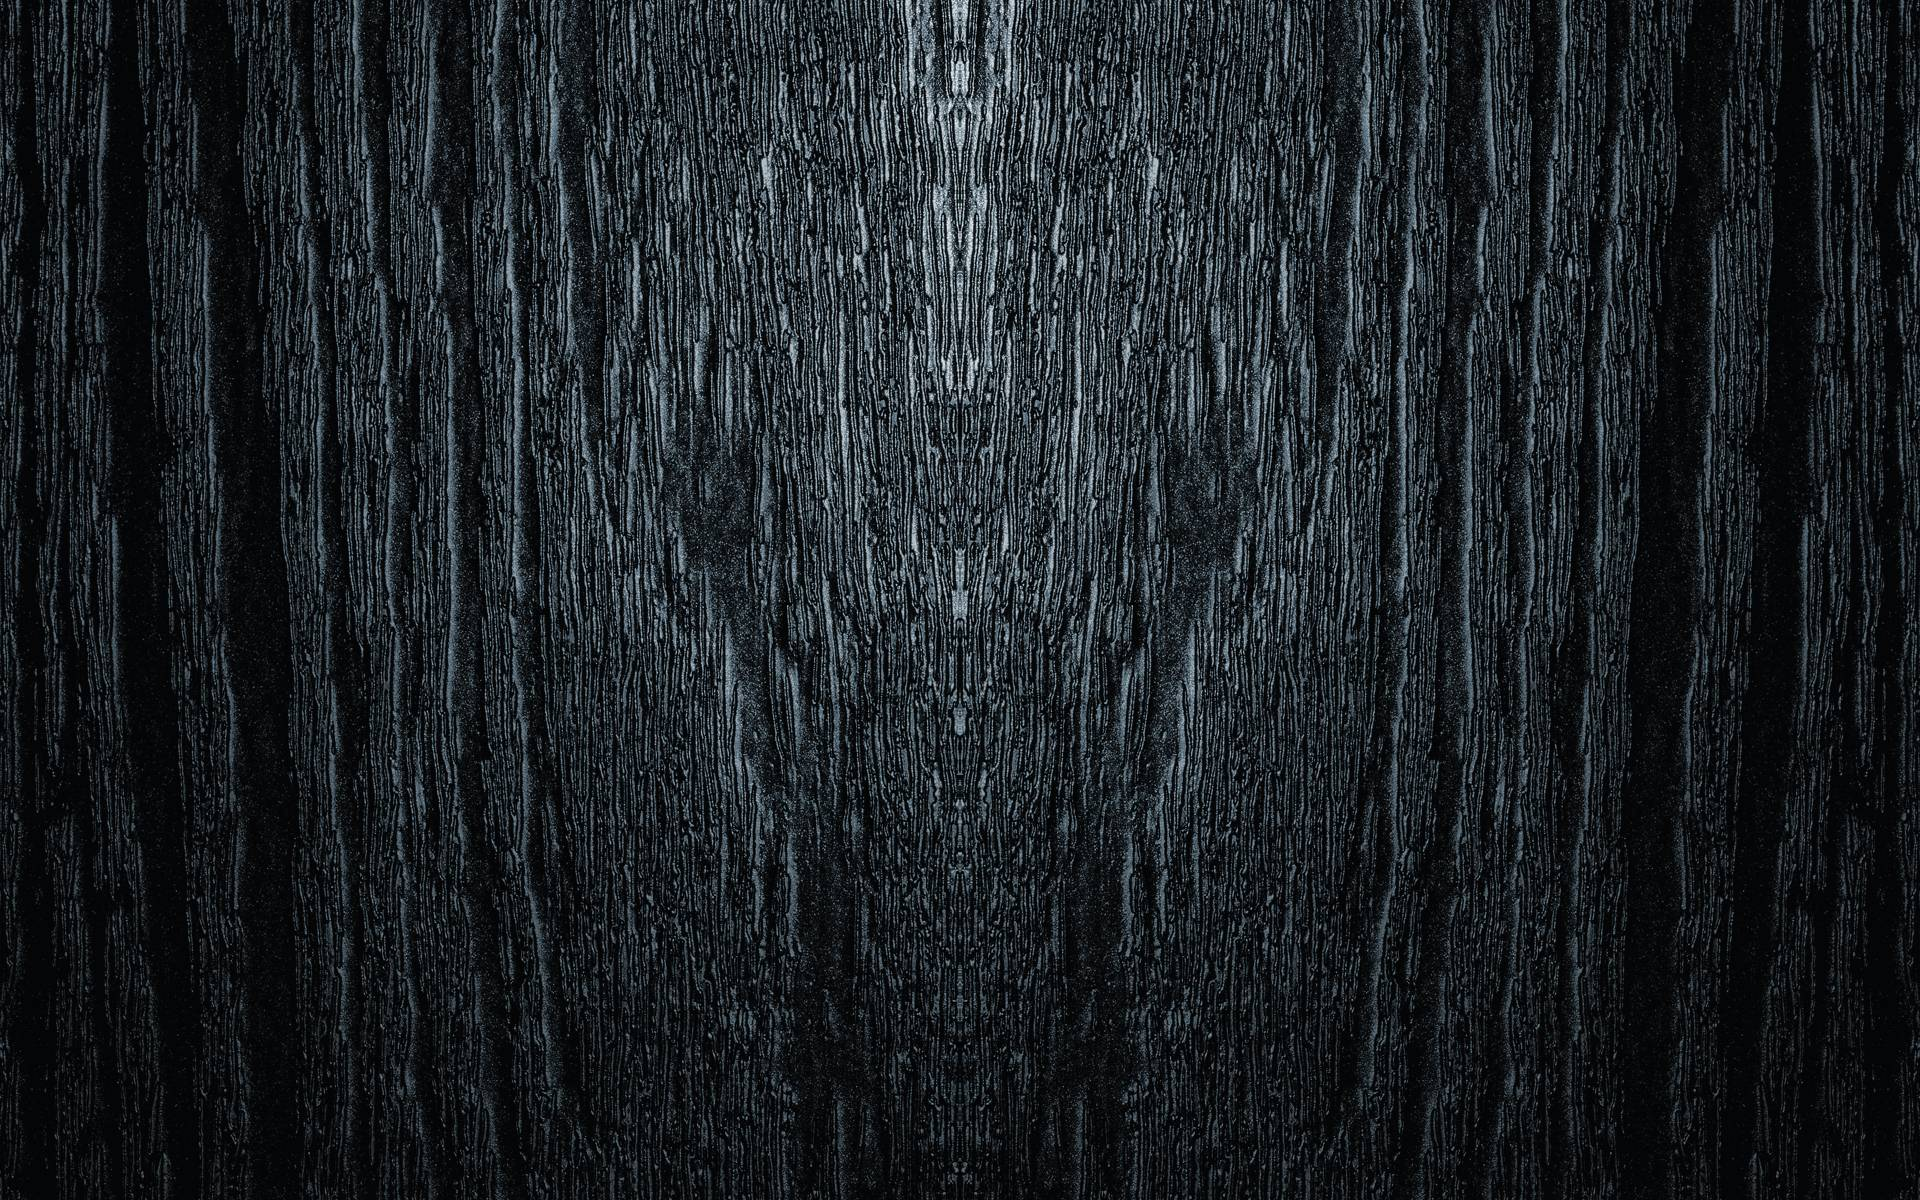 Black Wood Wallpaper 4k